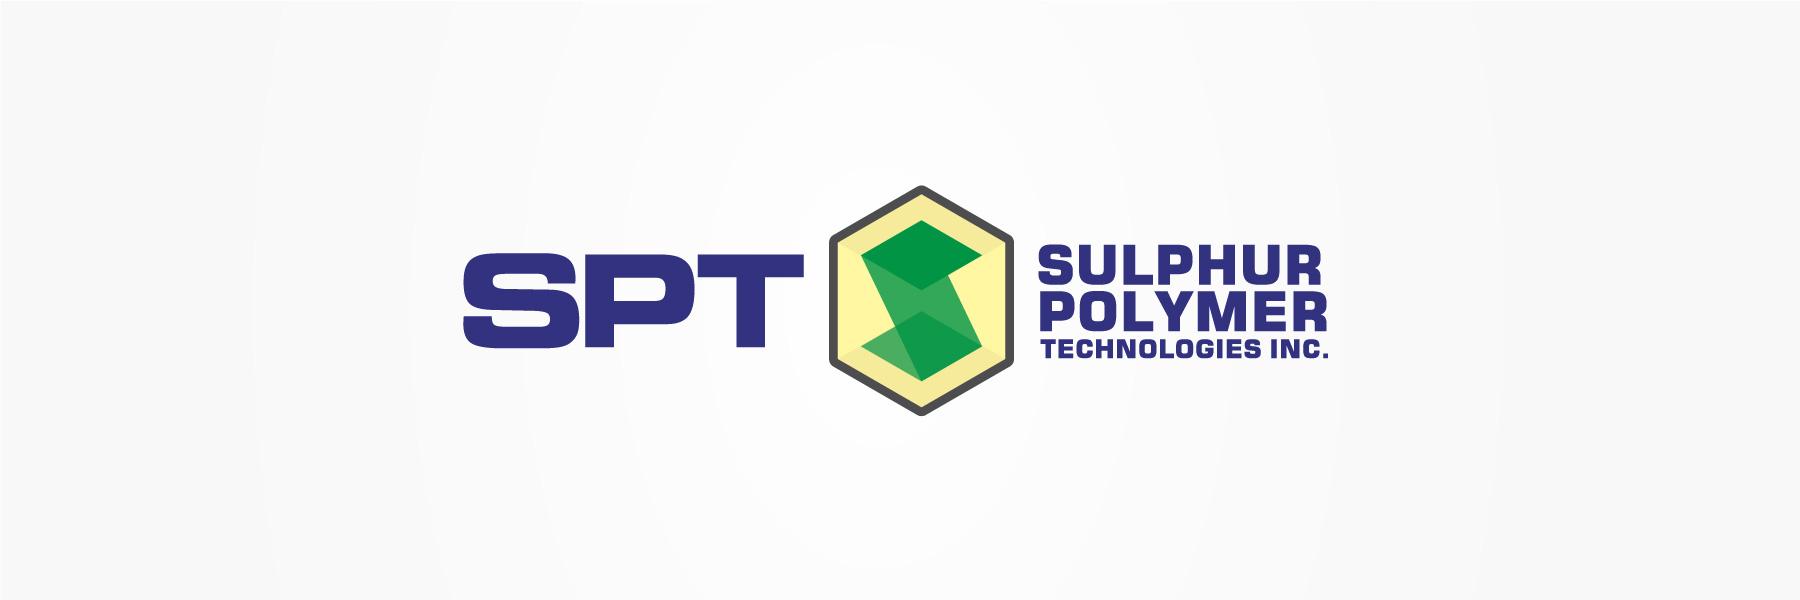 Sulphur-polymer-logo-design